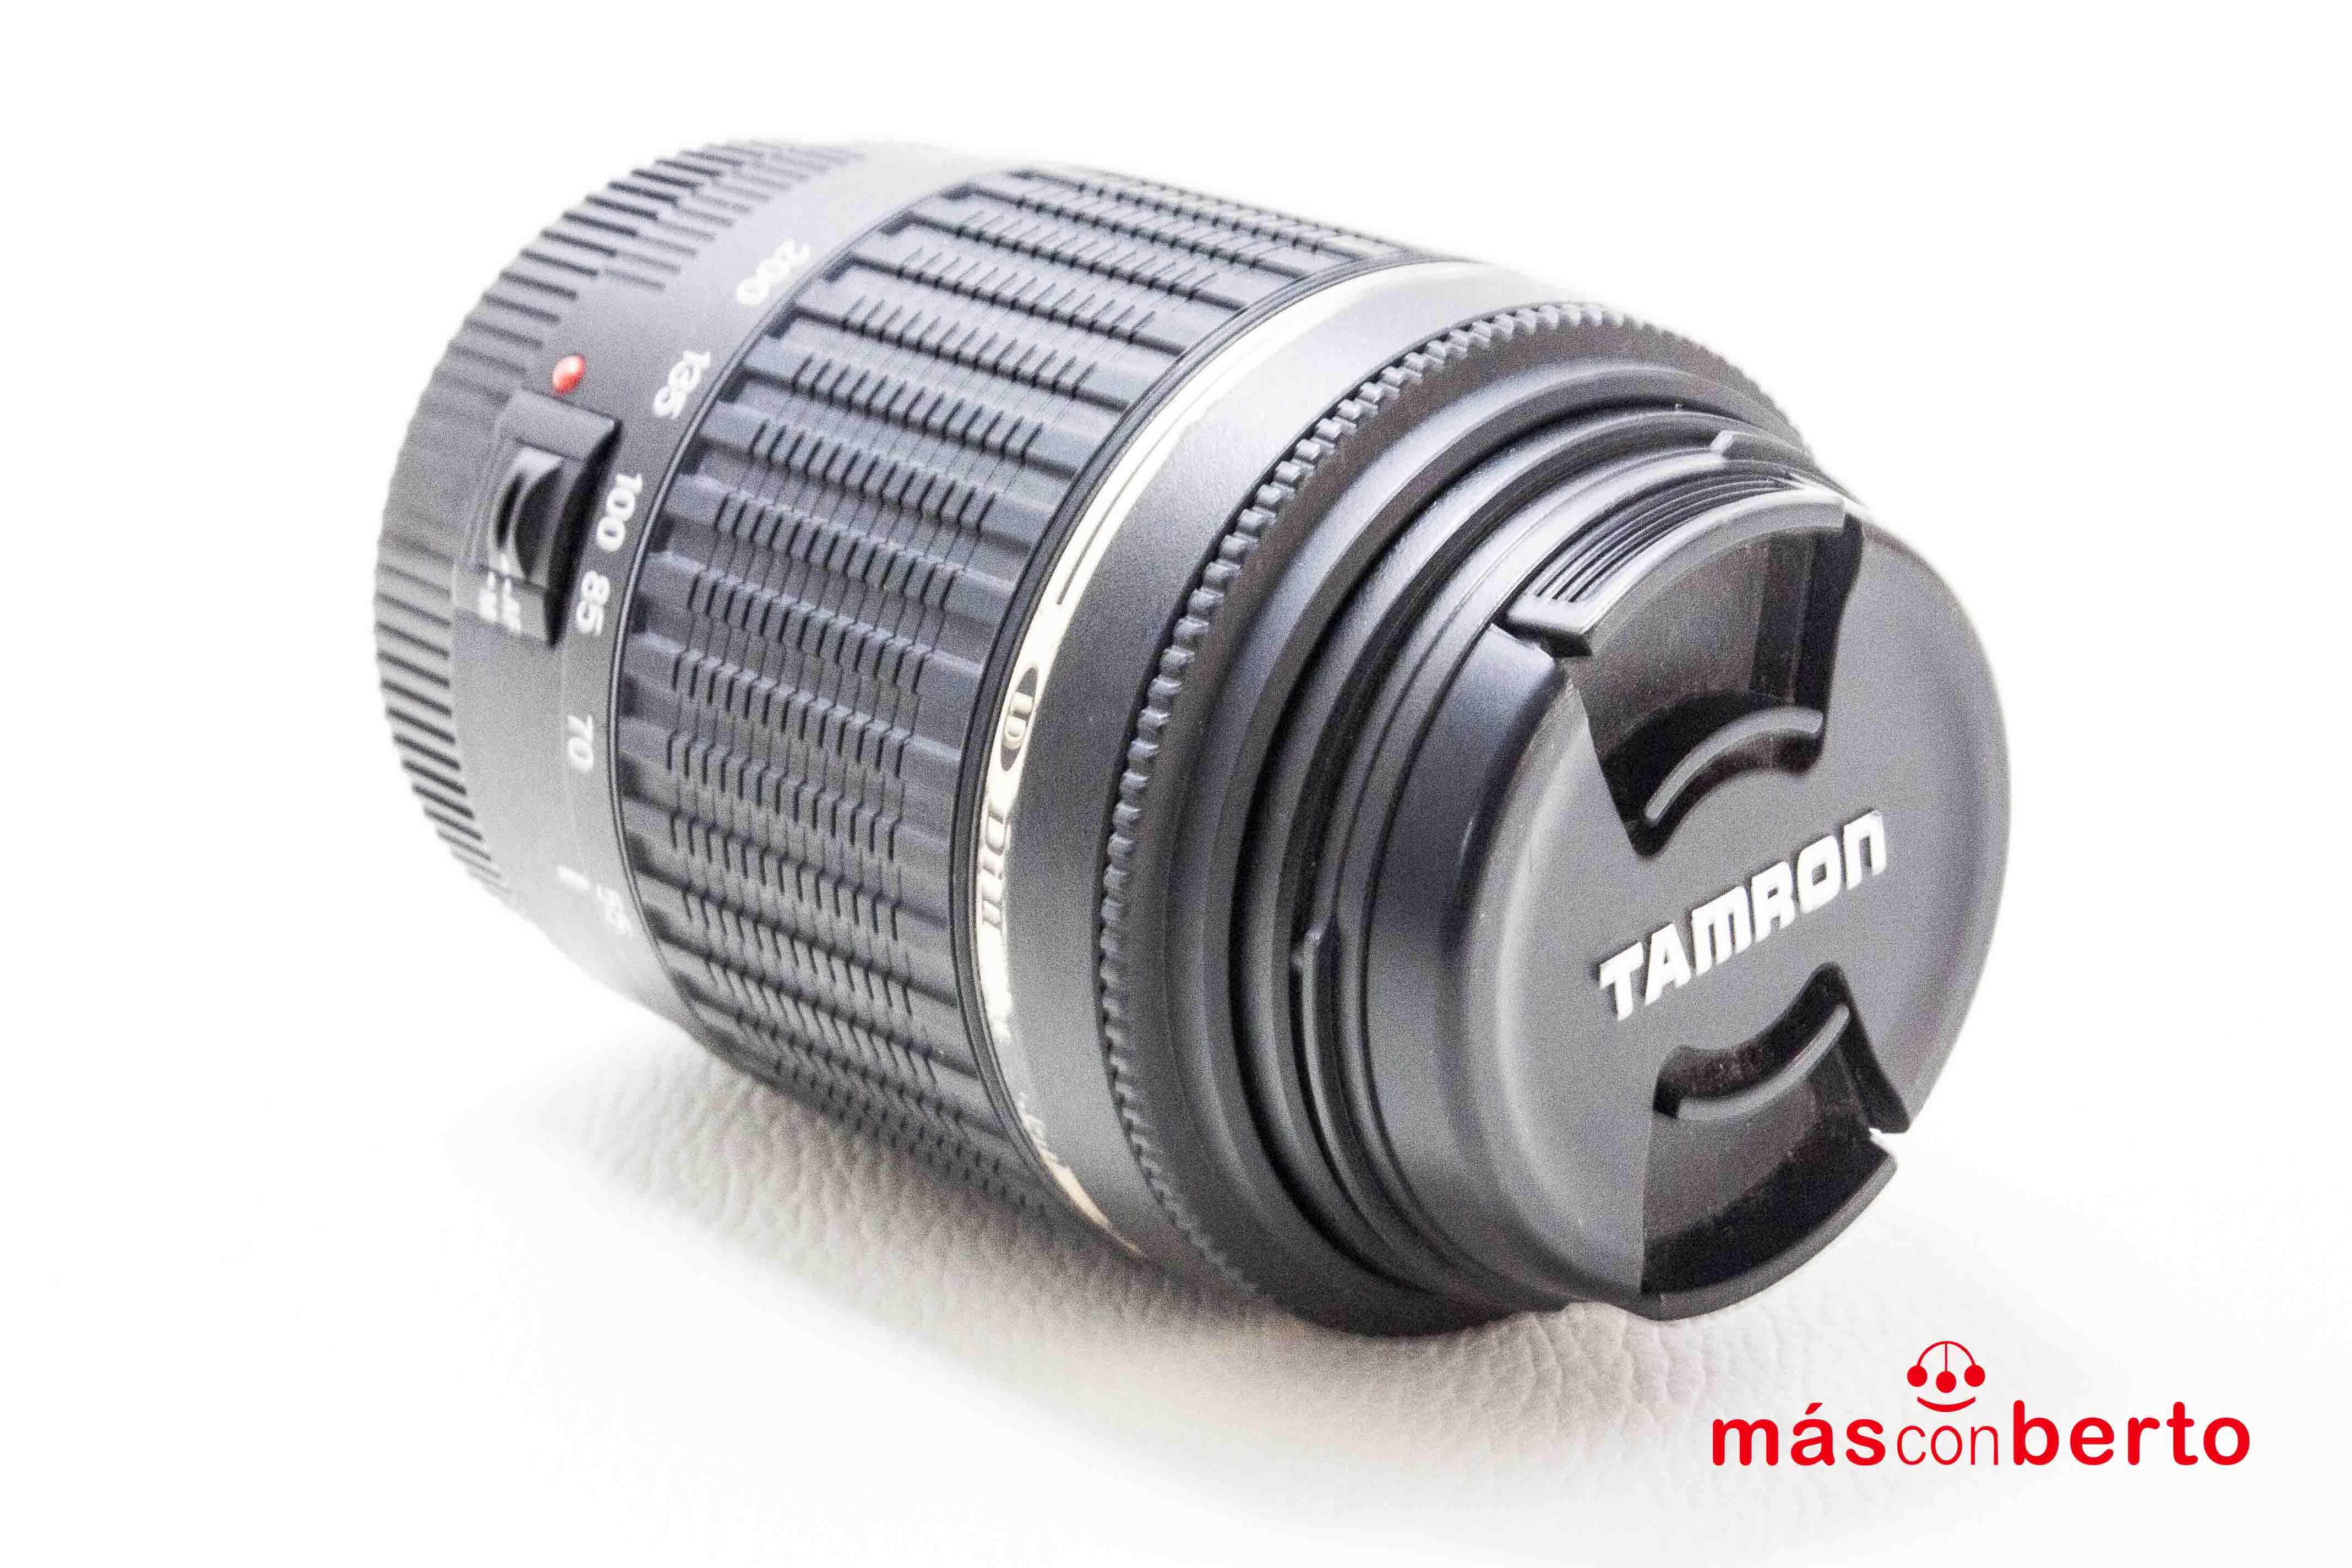 Objetivo Tamron 55-200mm